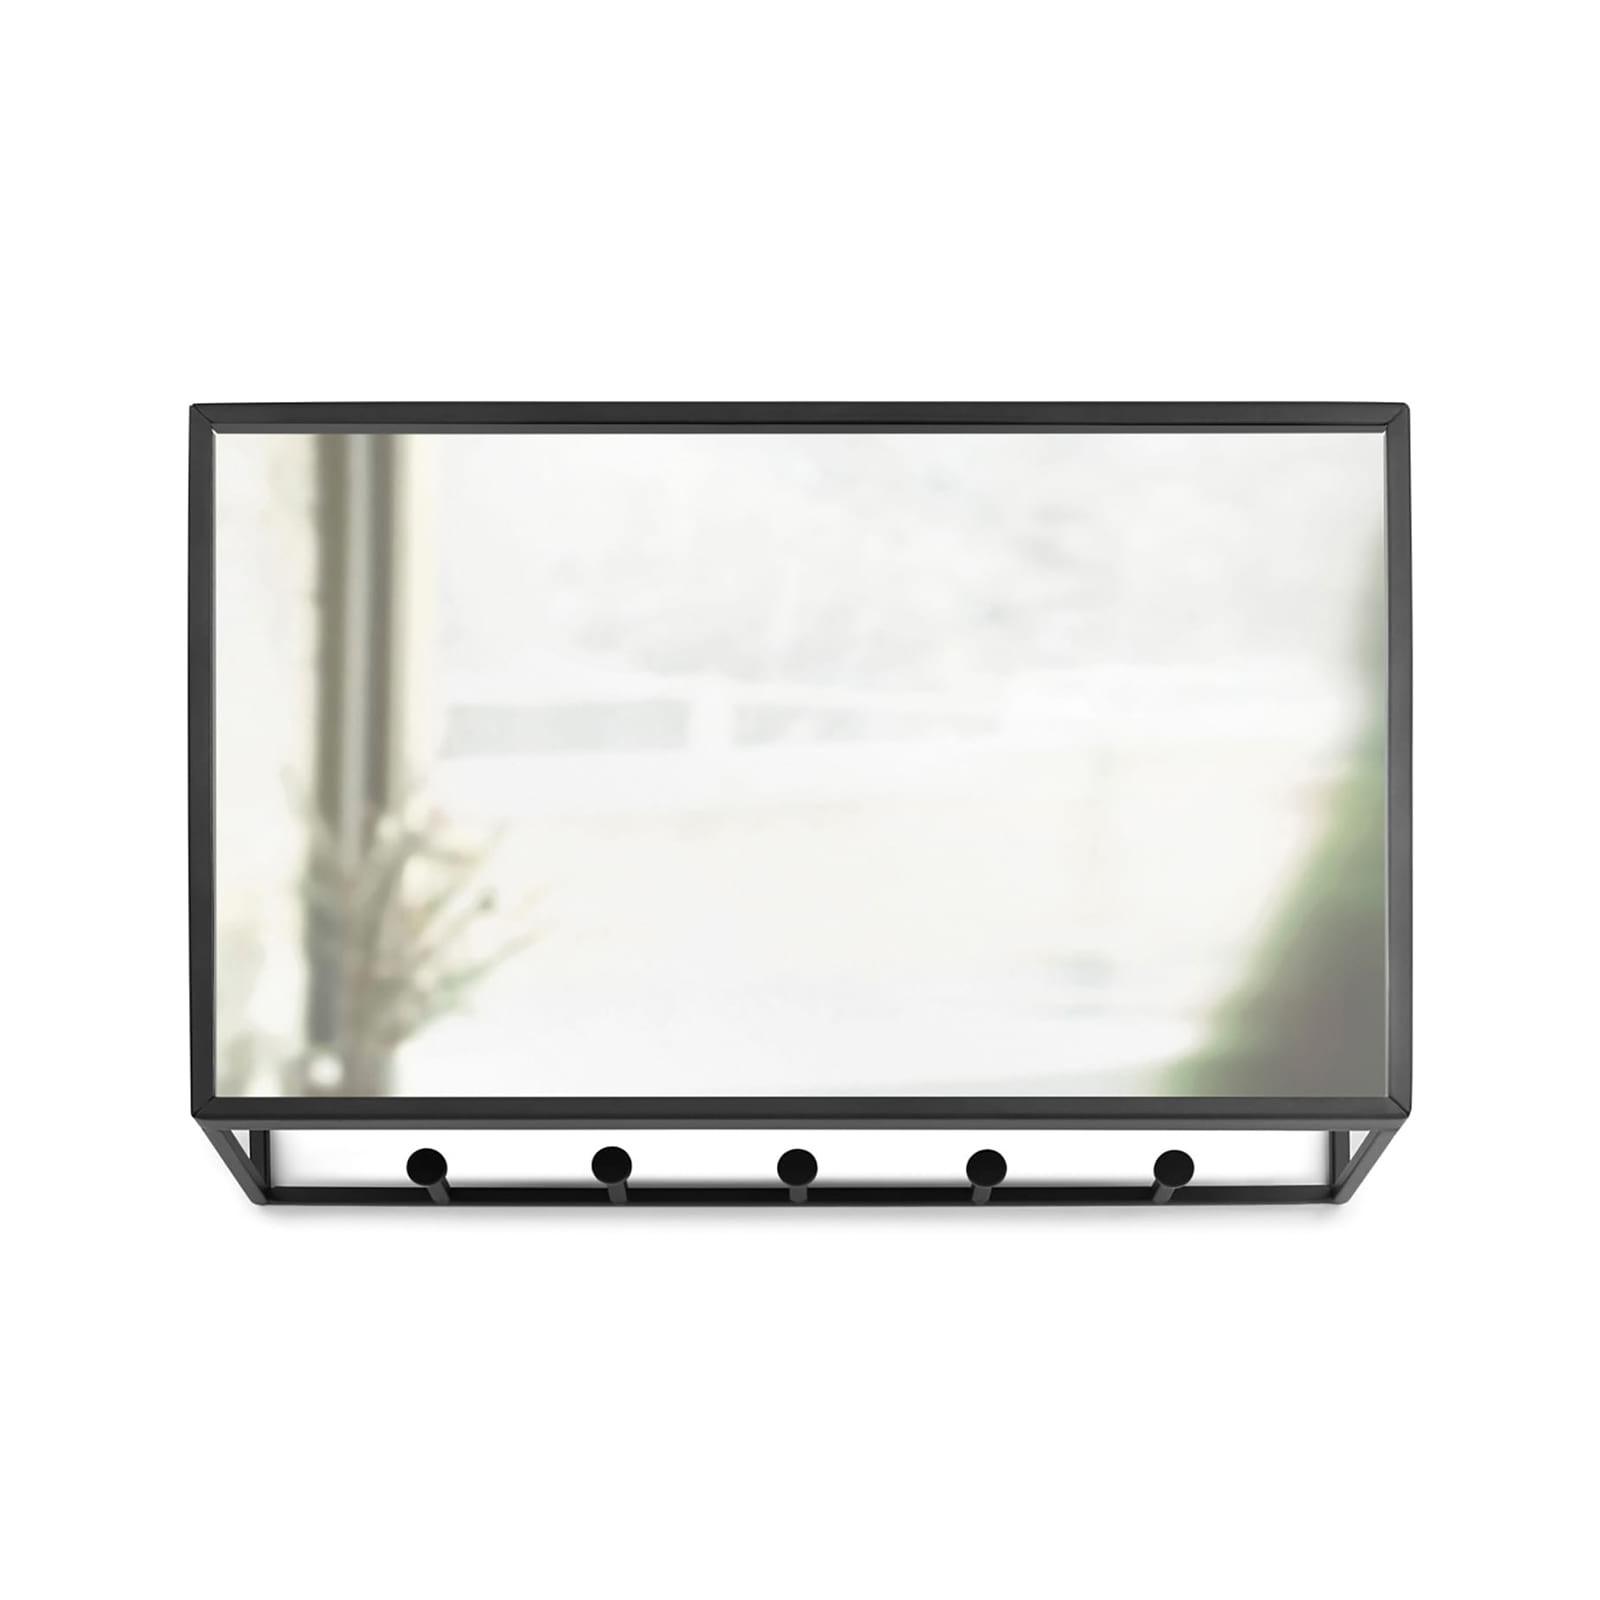 Cubiko Wall Mirror and Storage Unit (Black) - Umbra